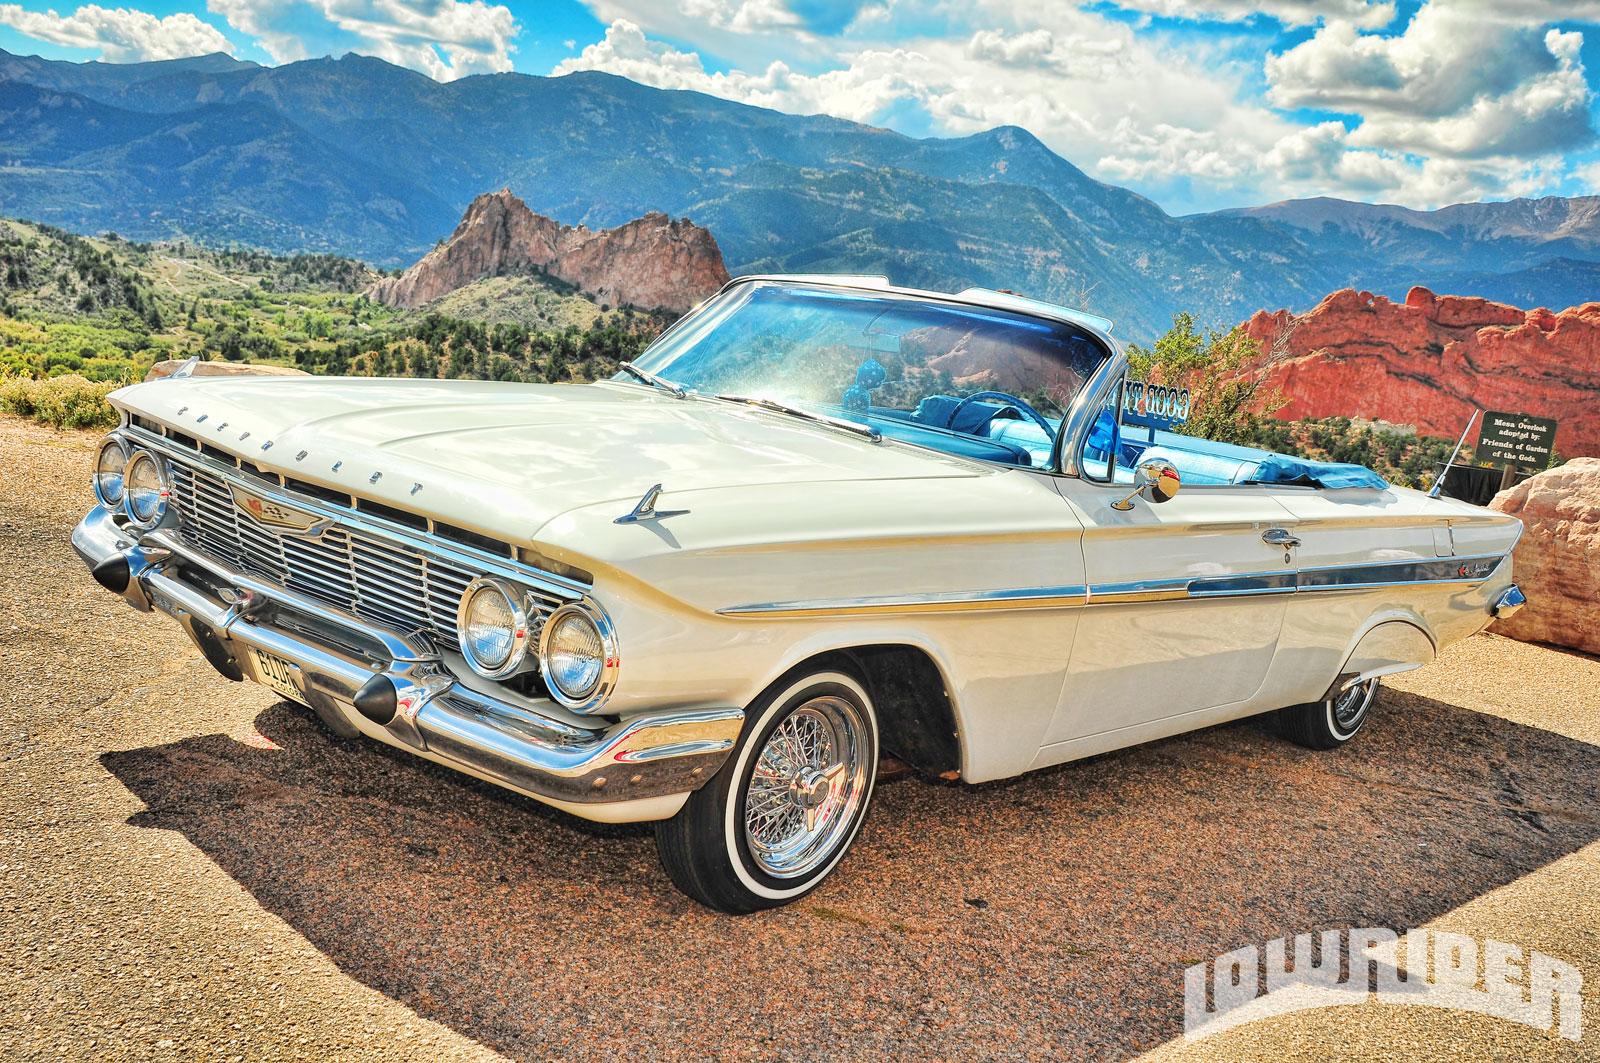 1961 Chevrolet Impala Convertible & 1959 Chevrolet Impala Convertible - Lowrider Magazine